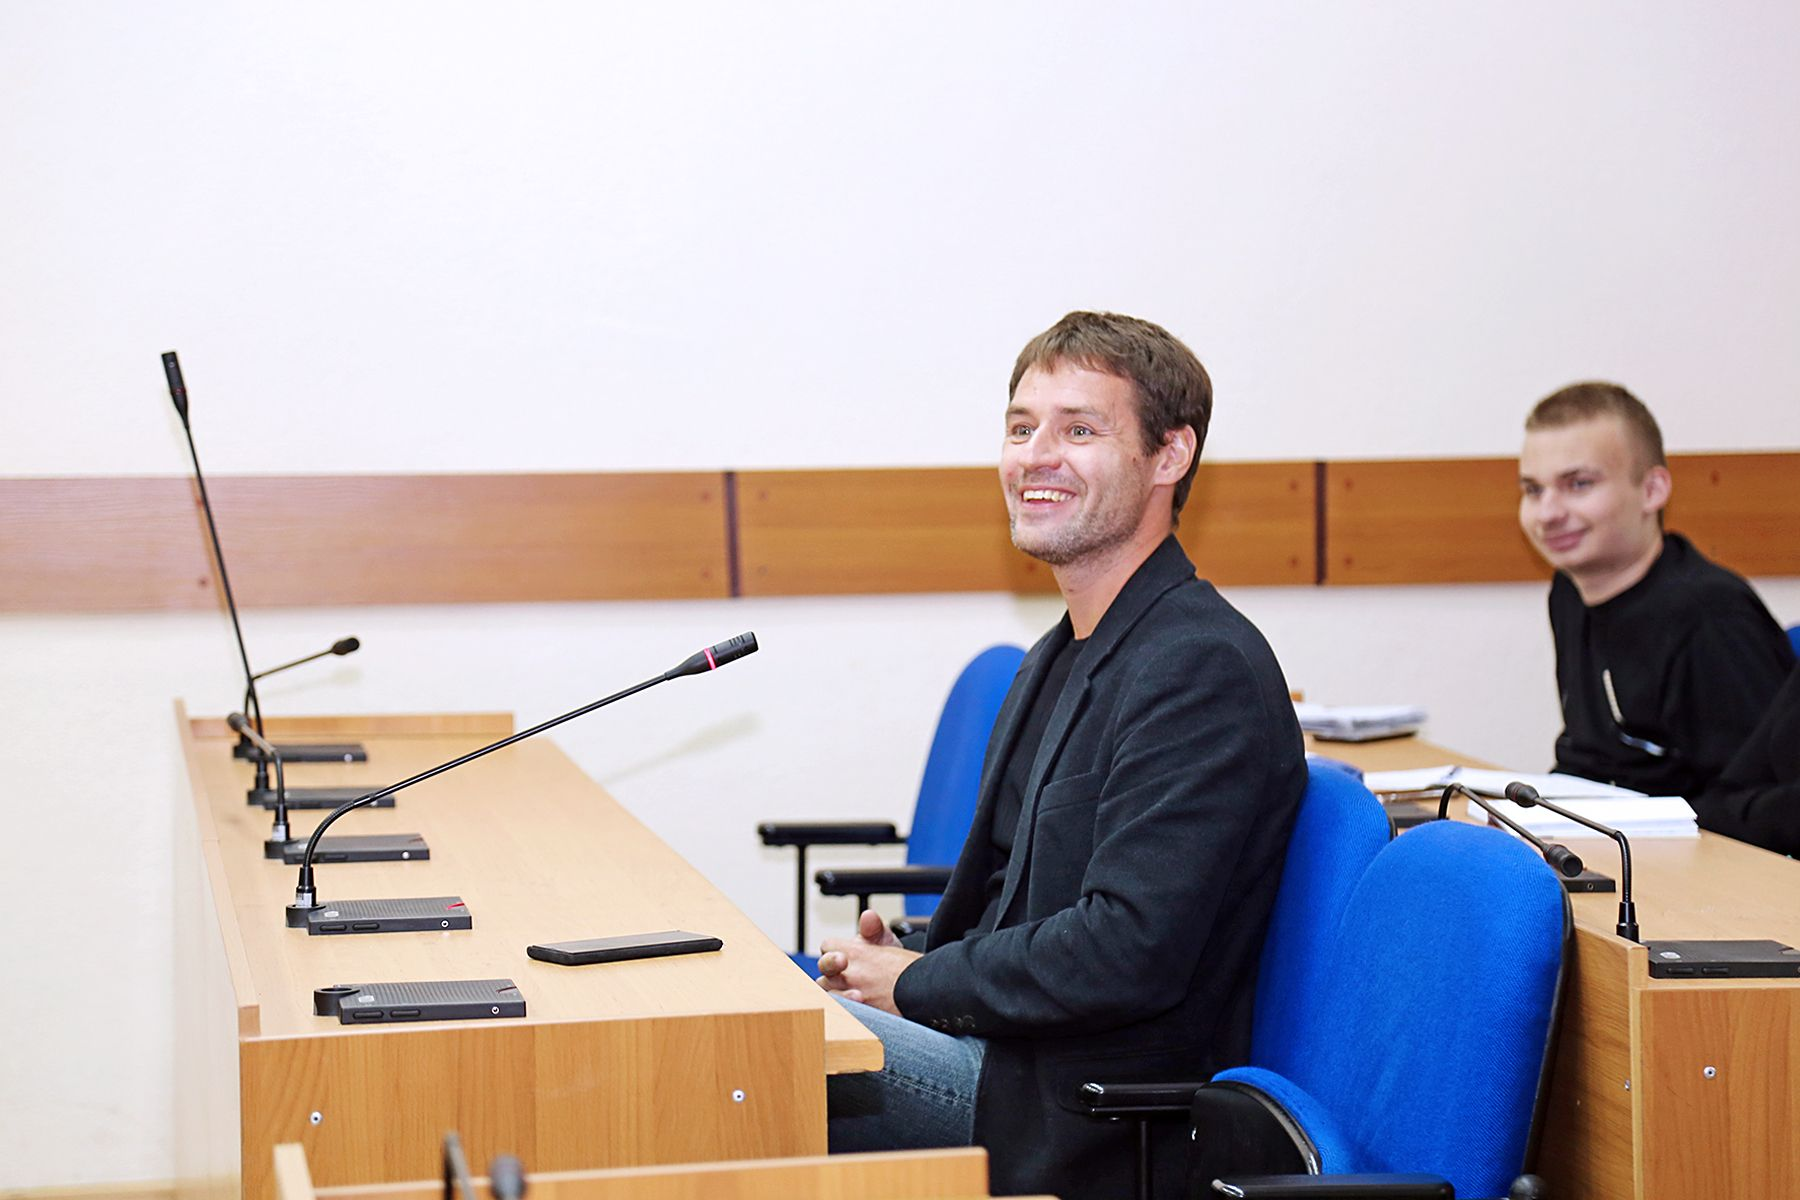 Киберпреступность, DarkNet и криптовалюту обсудили на Цифровой школе во ВГУЭС